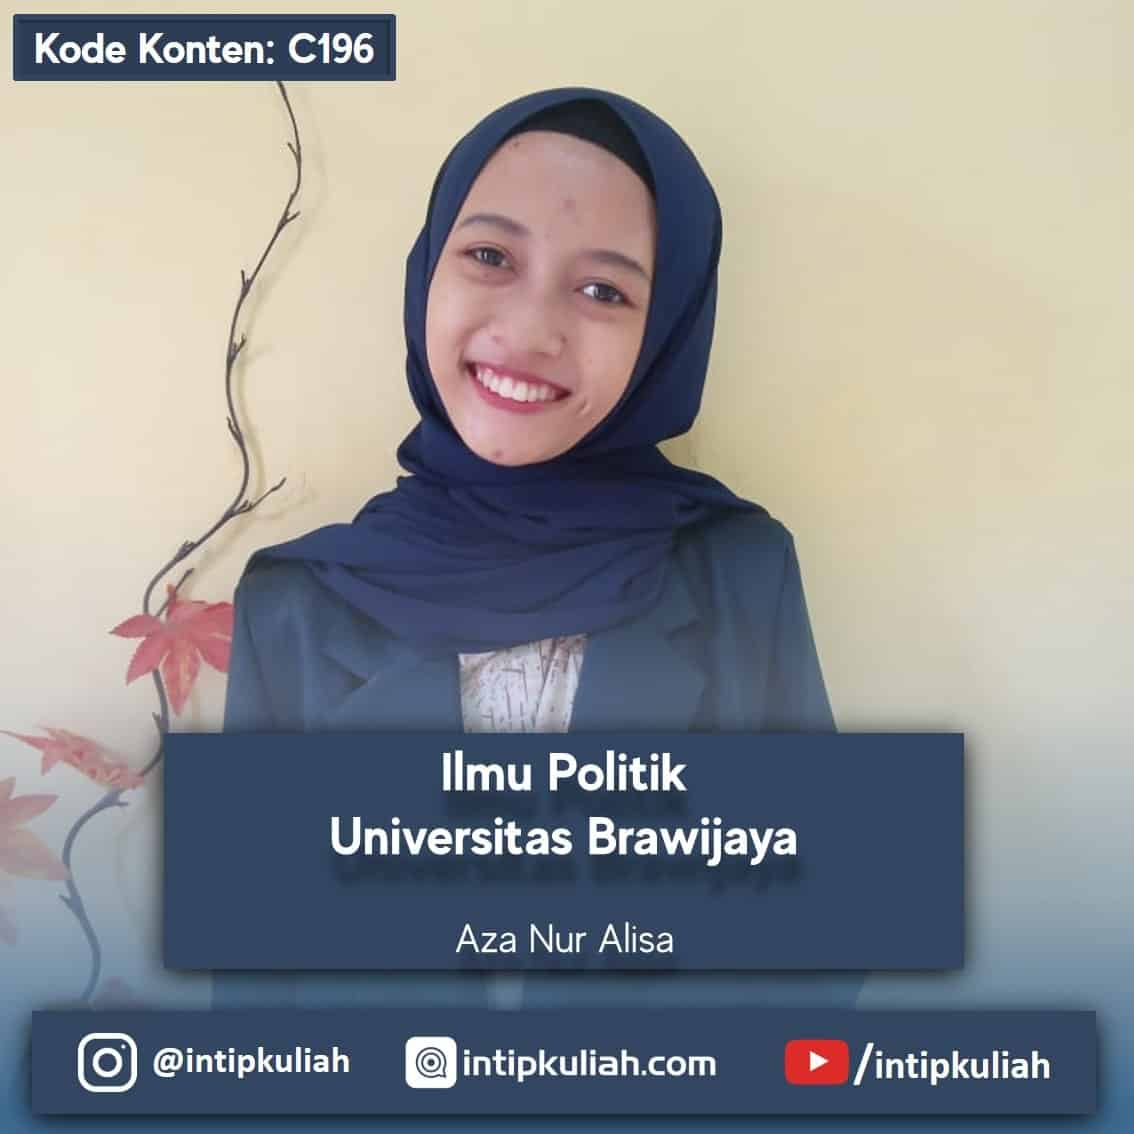 Ilmu Politik Universitas Brawijaya (Aza)